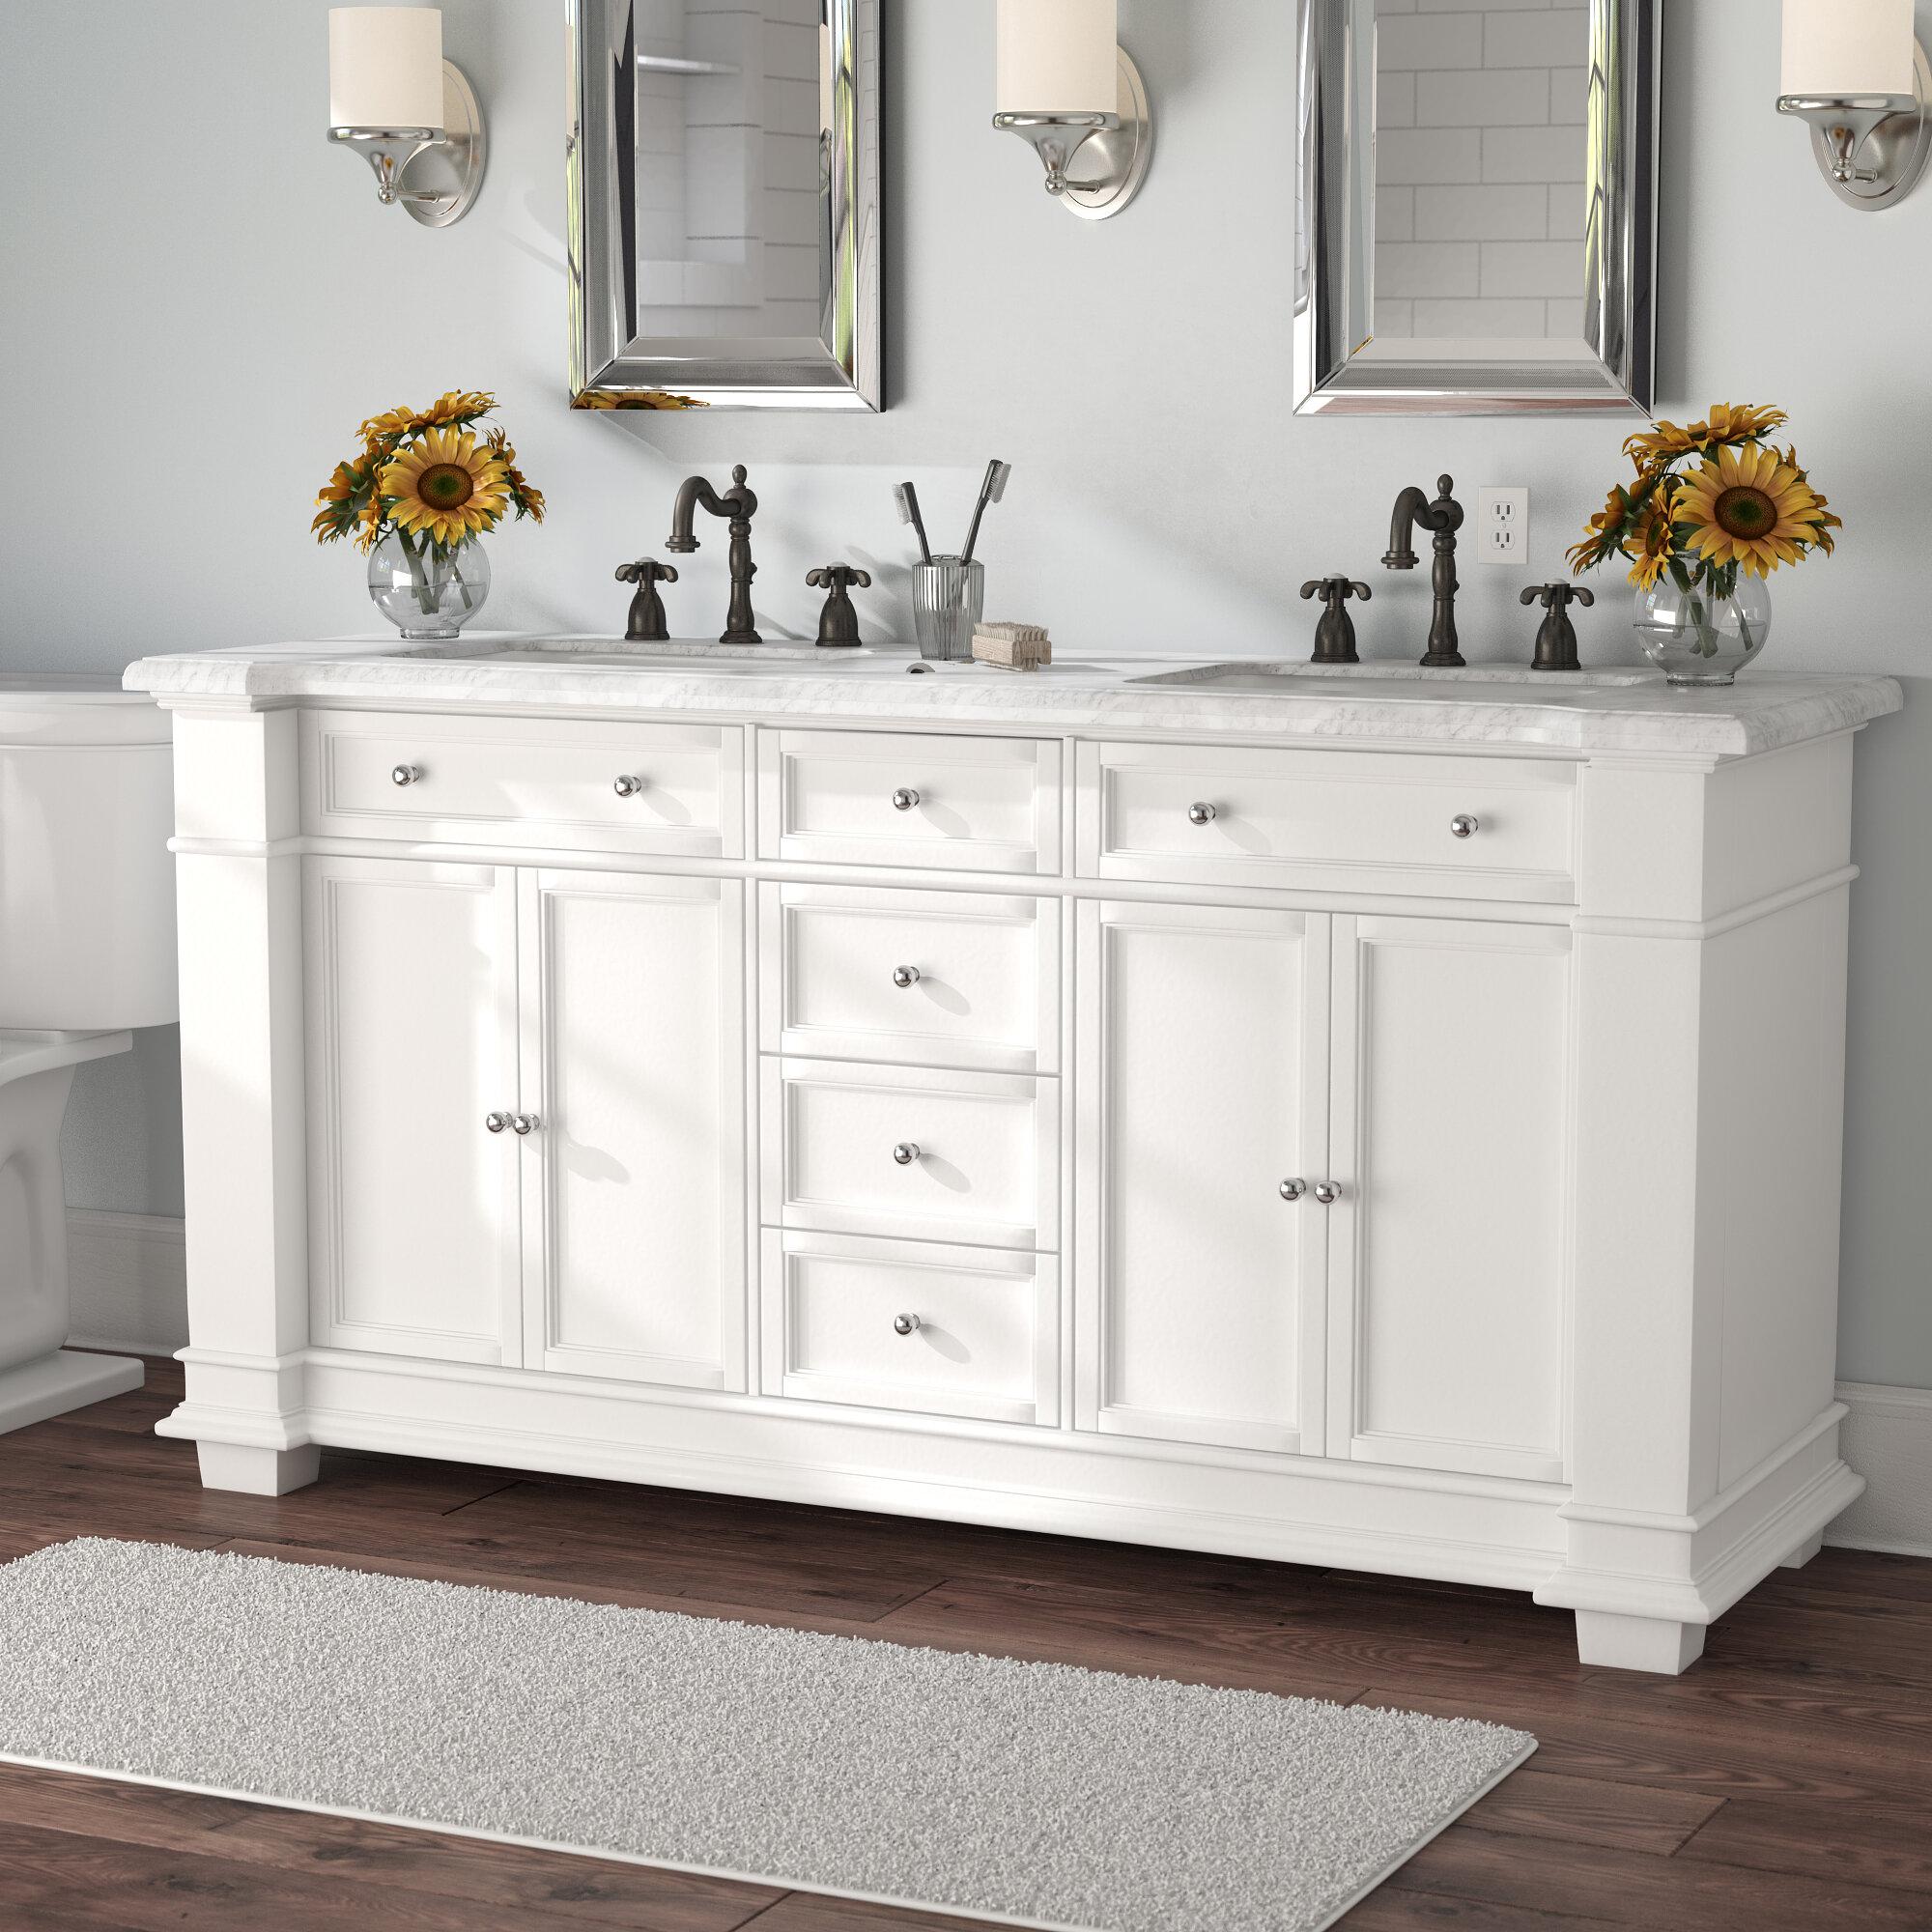 Outstanding Riccardo 72 Double Bathroom Vanity Set Interior Design Ideas Inesswwsoteloinfo